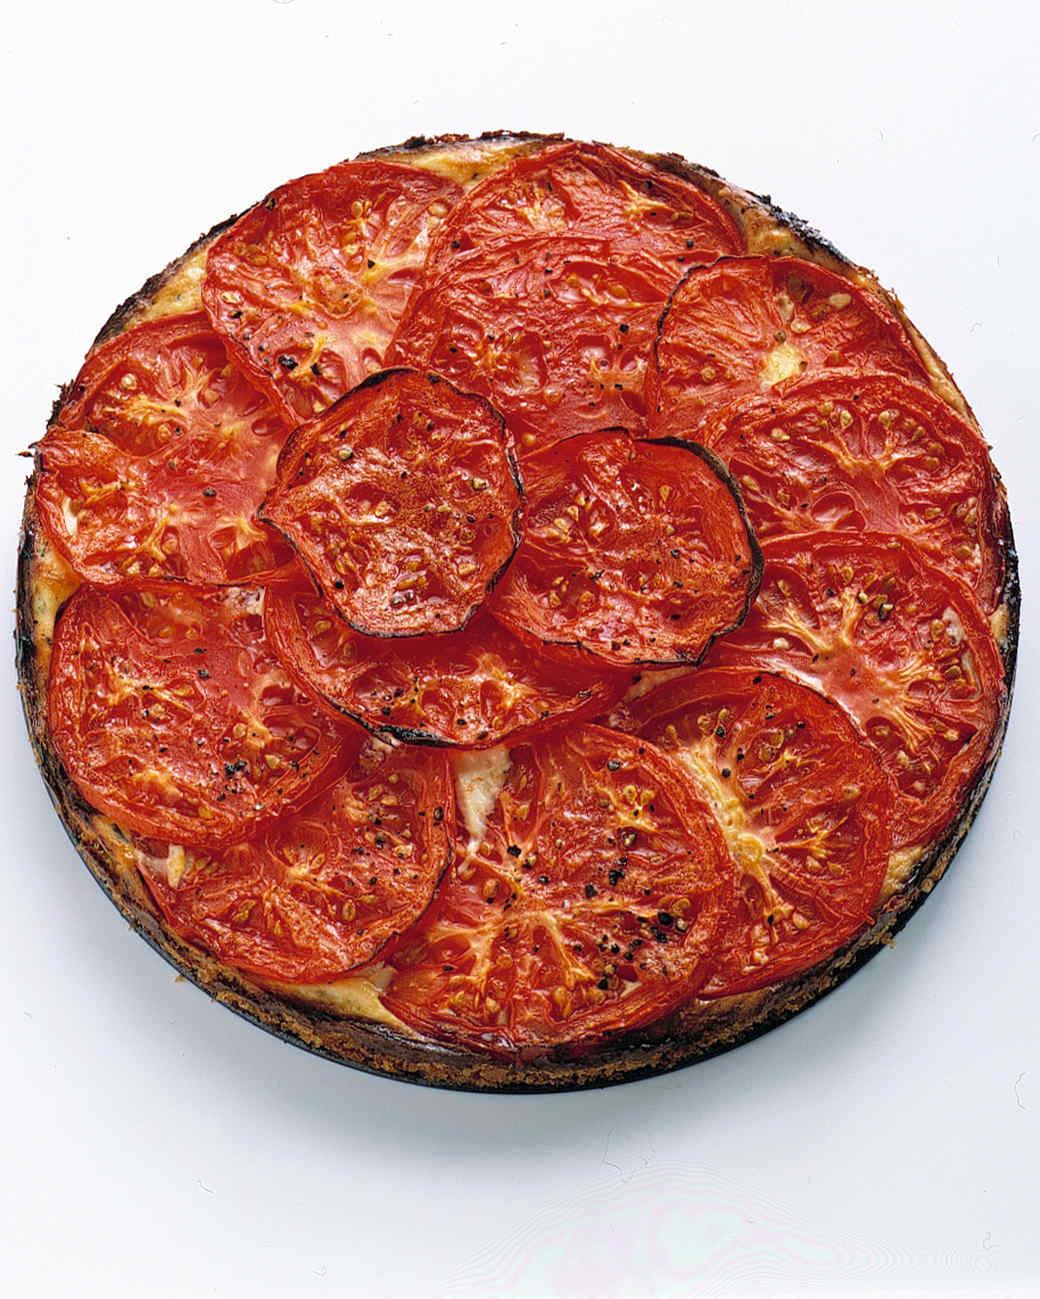 edf_mar03_tomatoes_tart.jpg